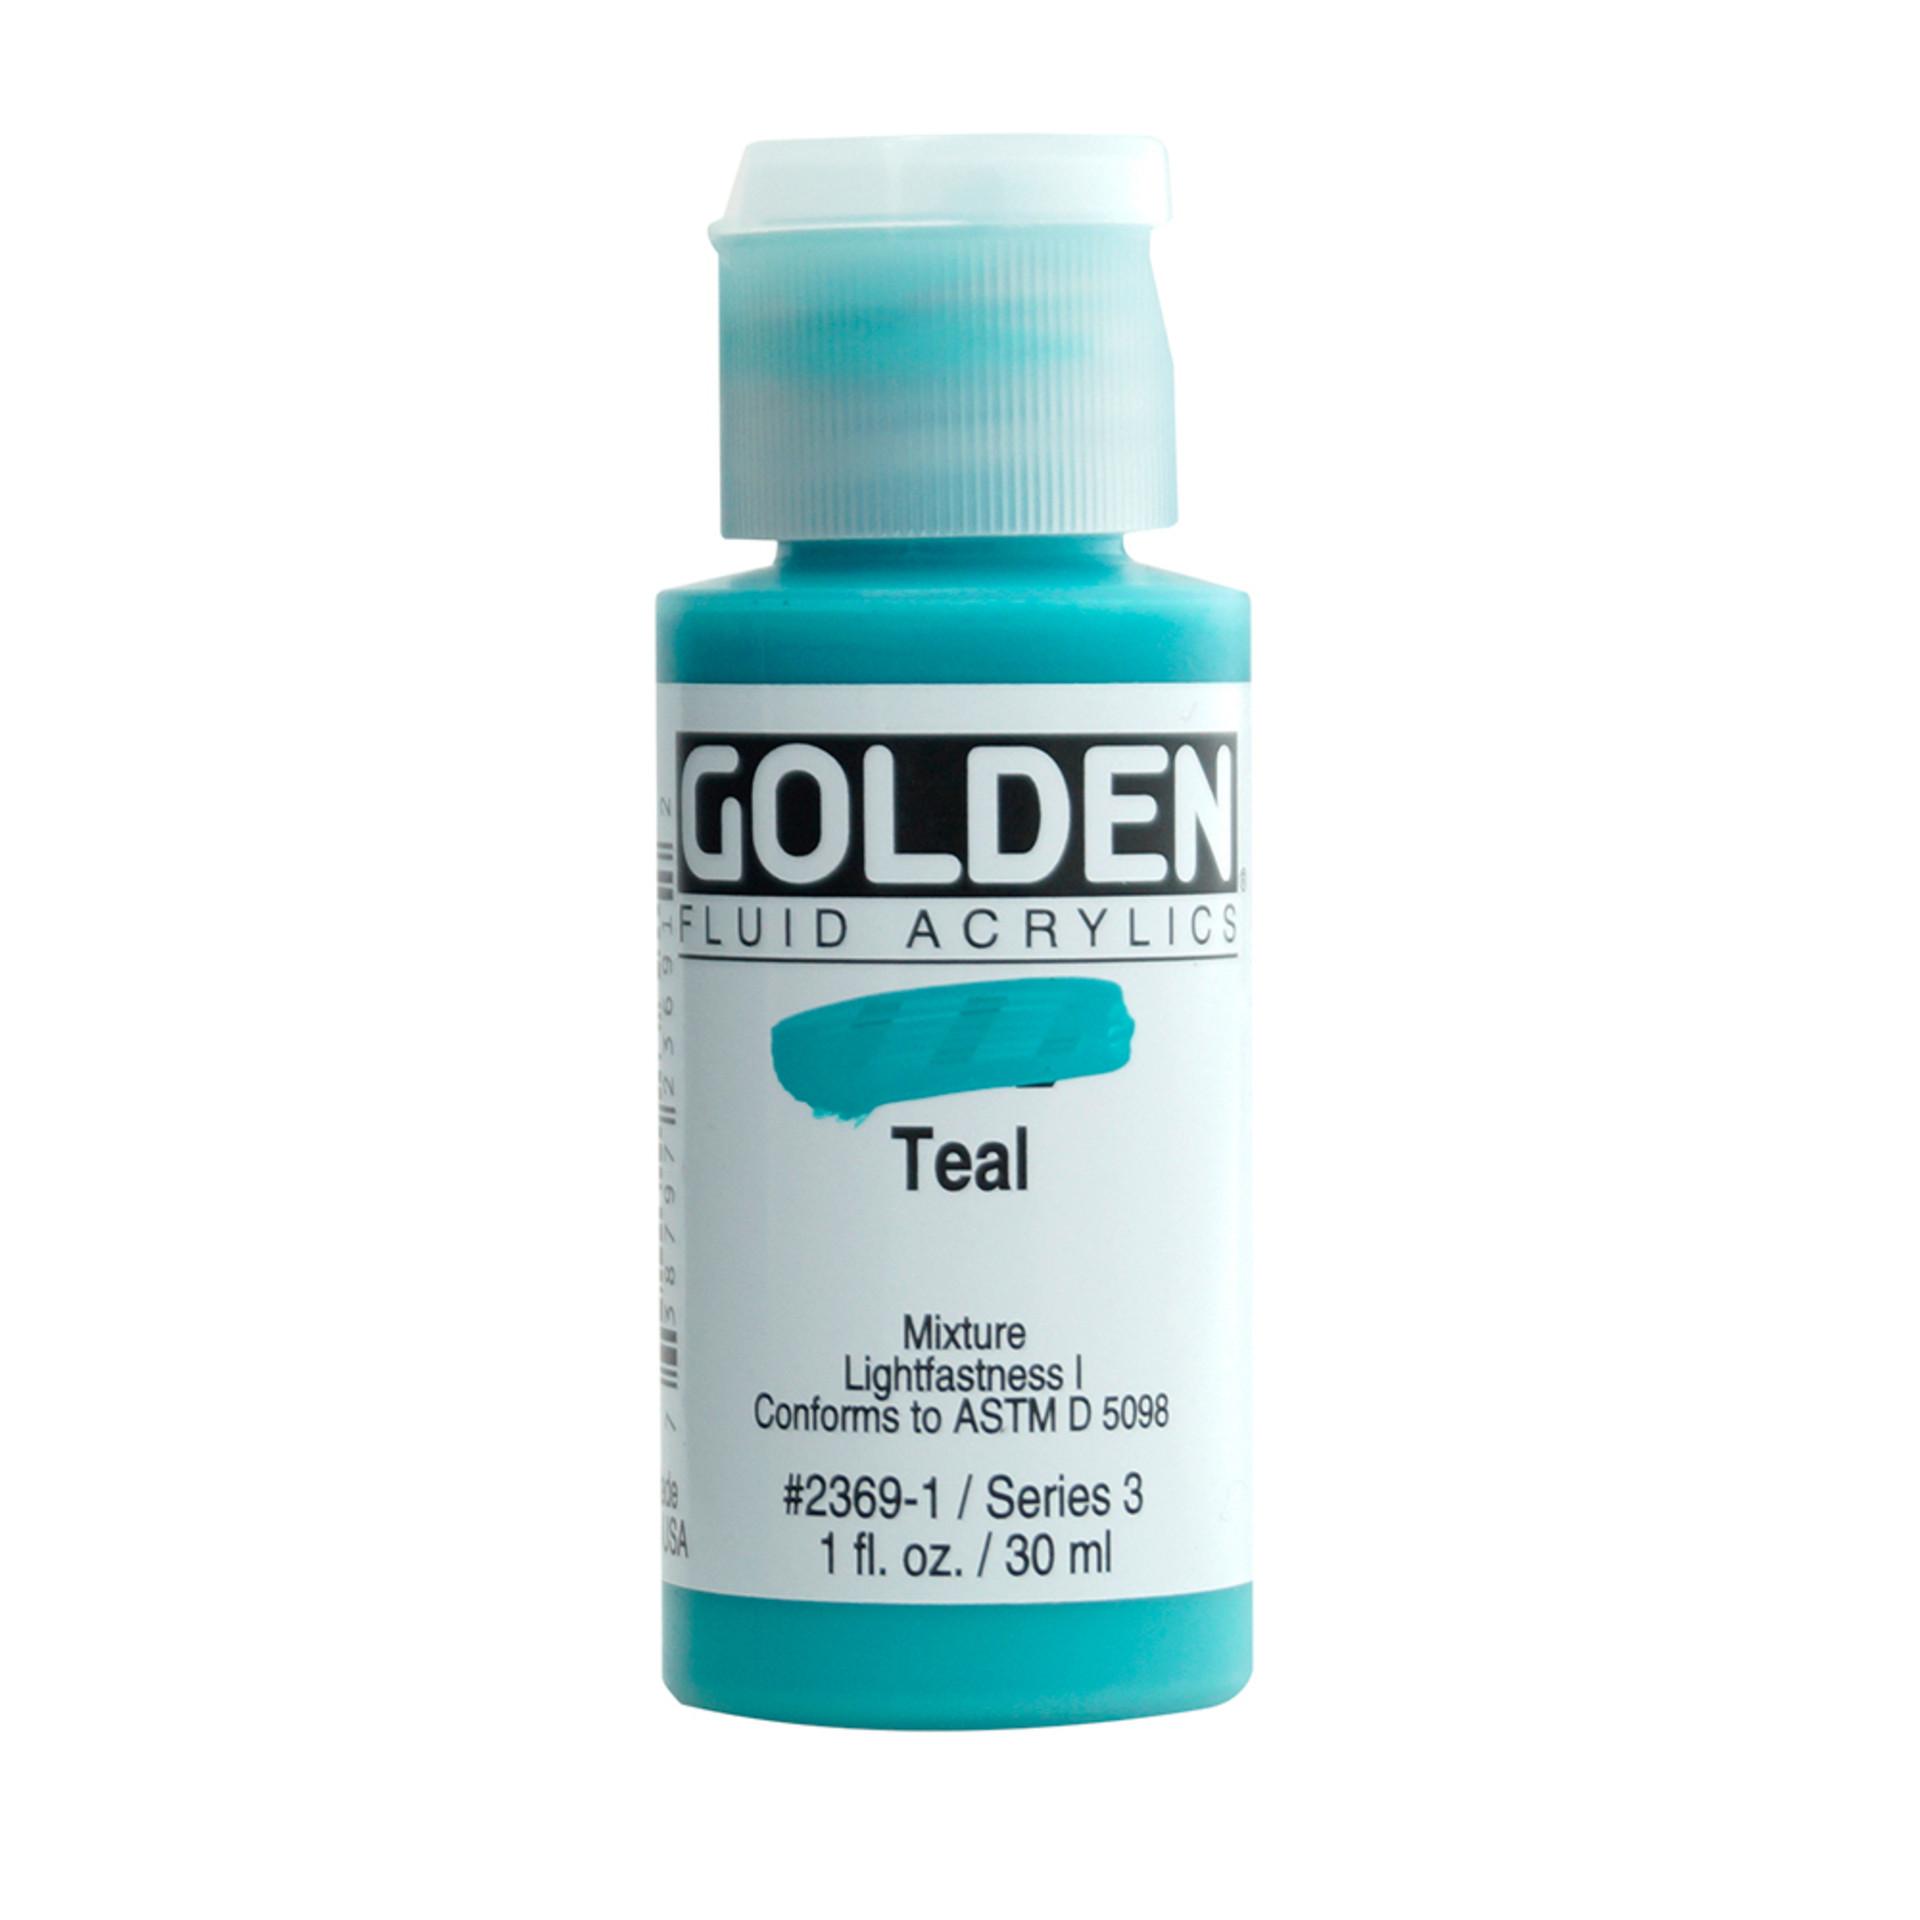 Golden Fluid Acrylic Bottle – Teal